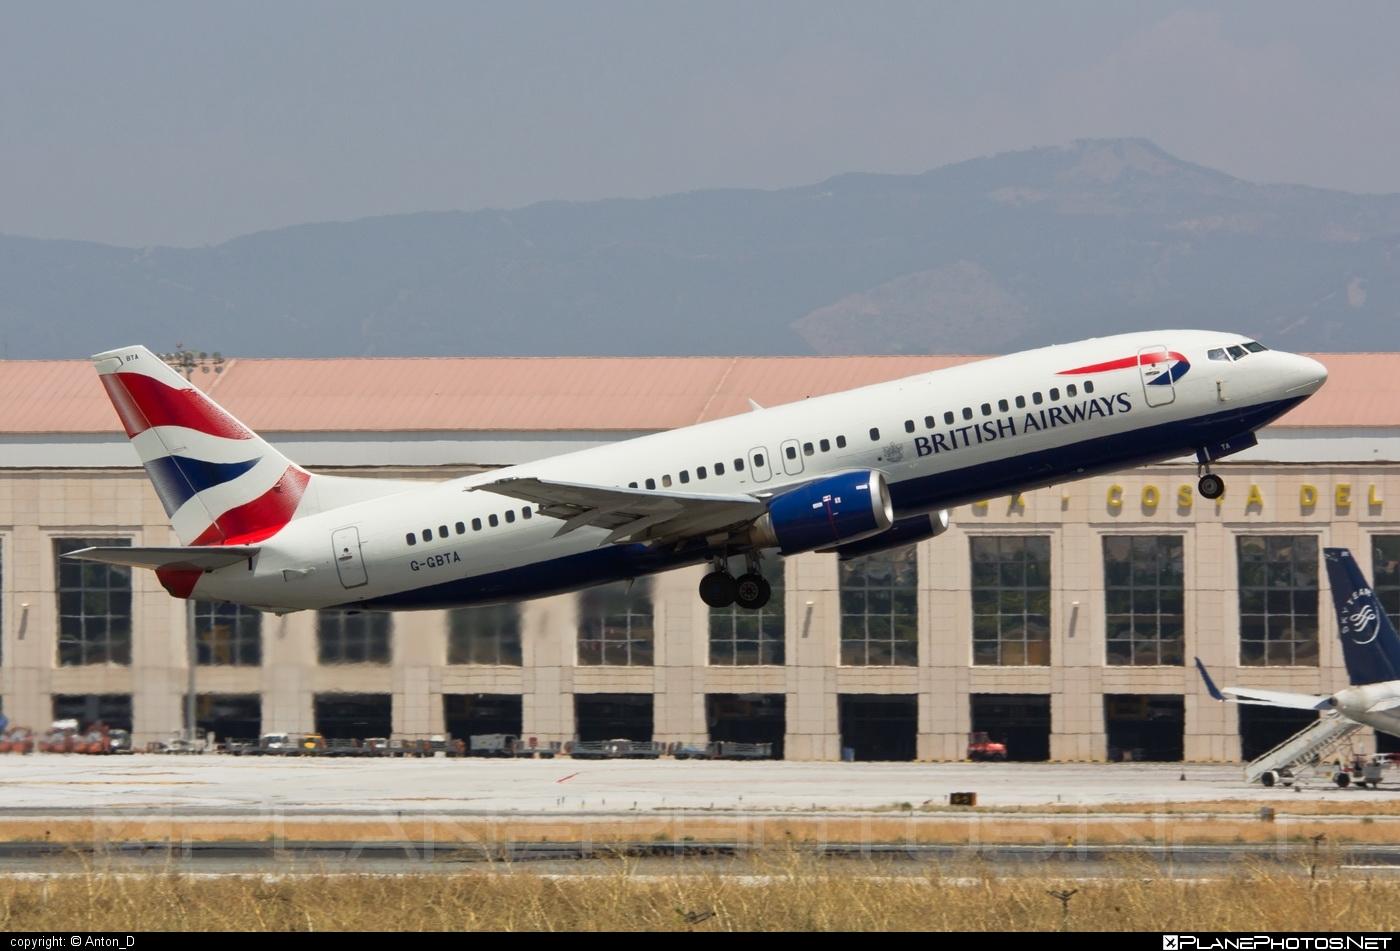 Boeing 737-400 - G-GBTA operated by British Airways #b737 #boeing #boeing737 #britishairways